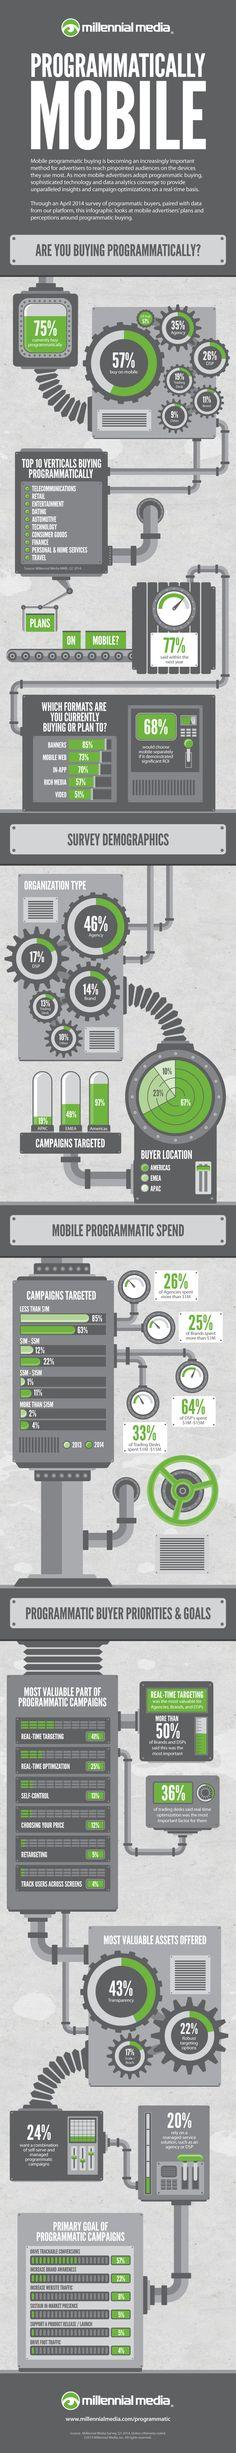 10 interesting digital marketing stats we've seen this week | Econsultancy